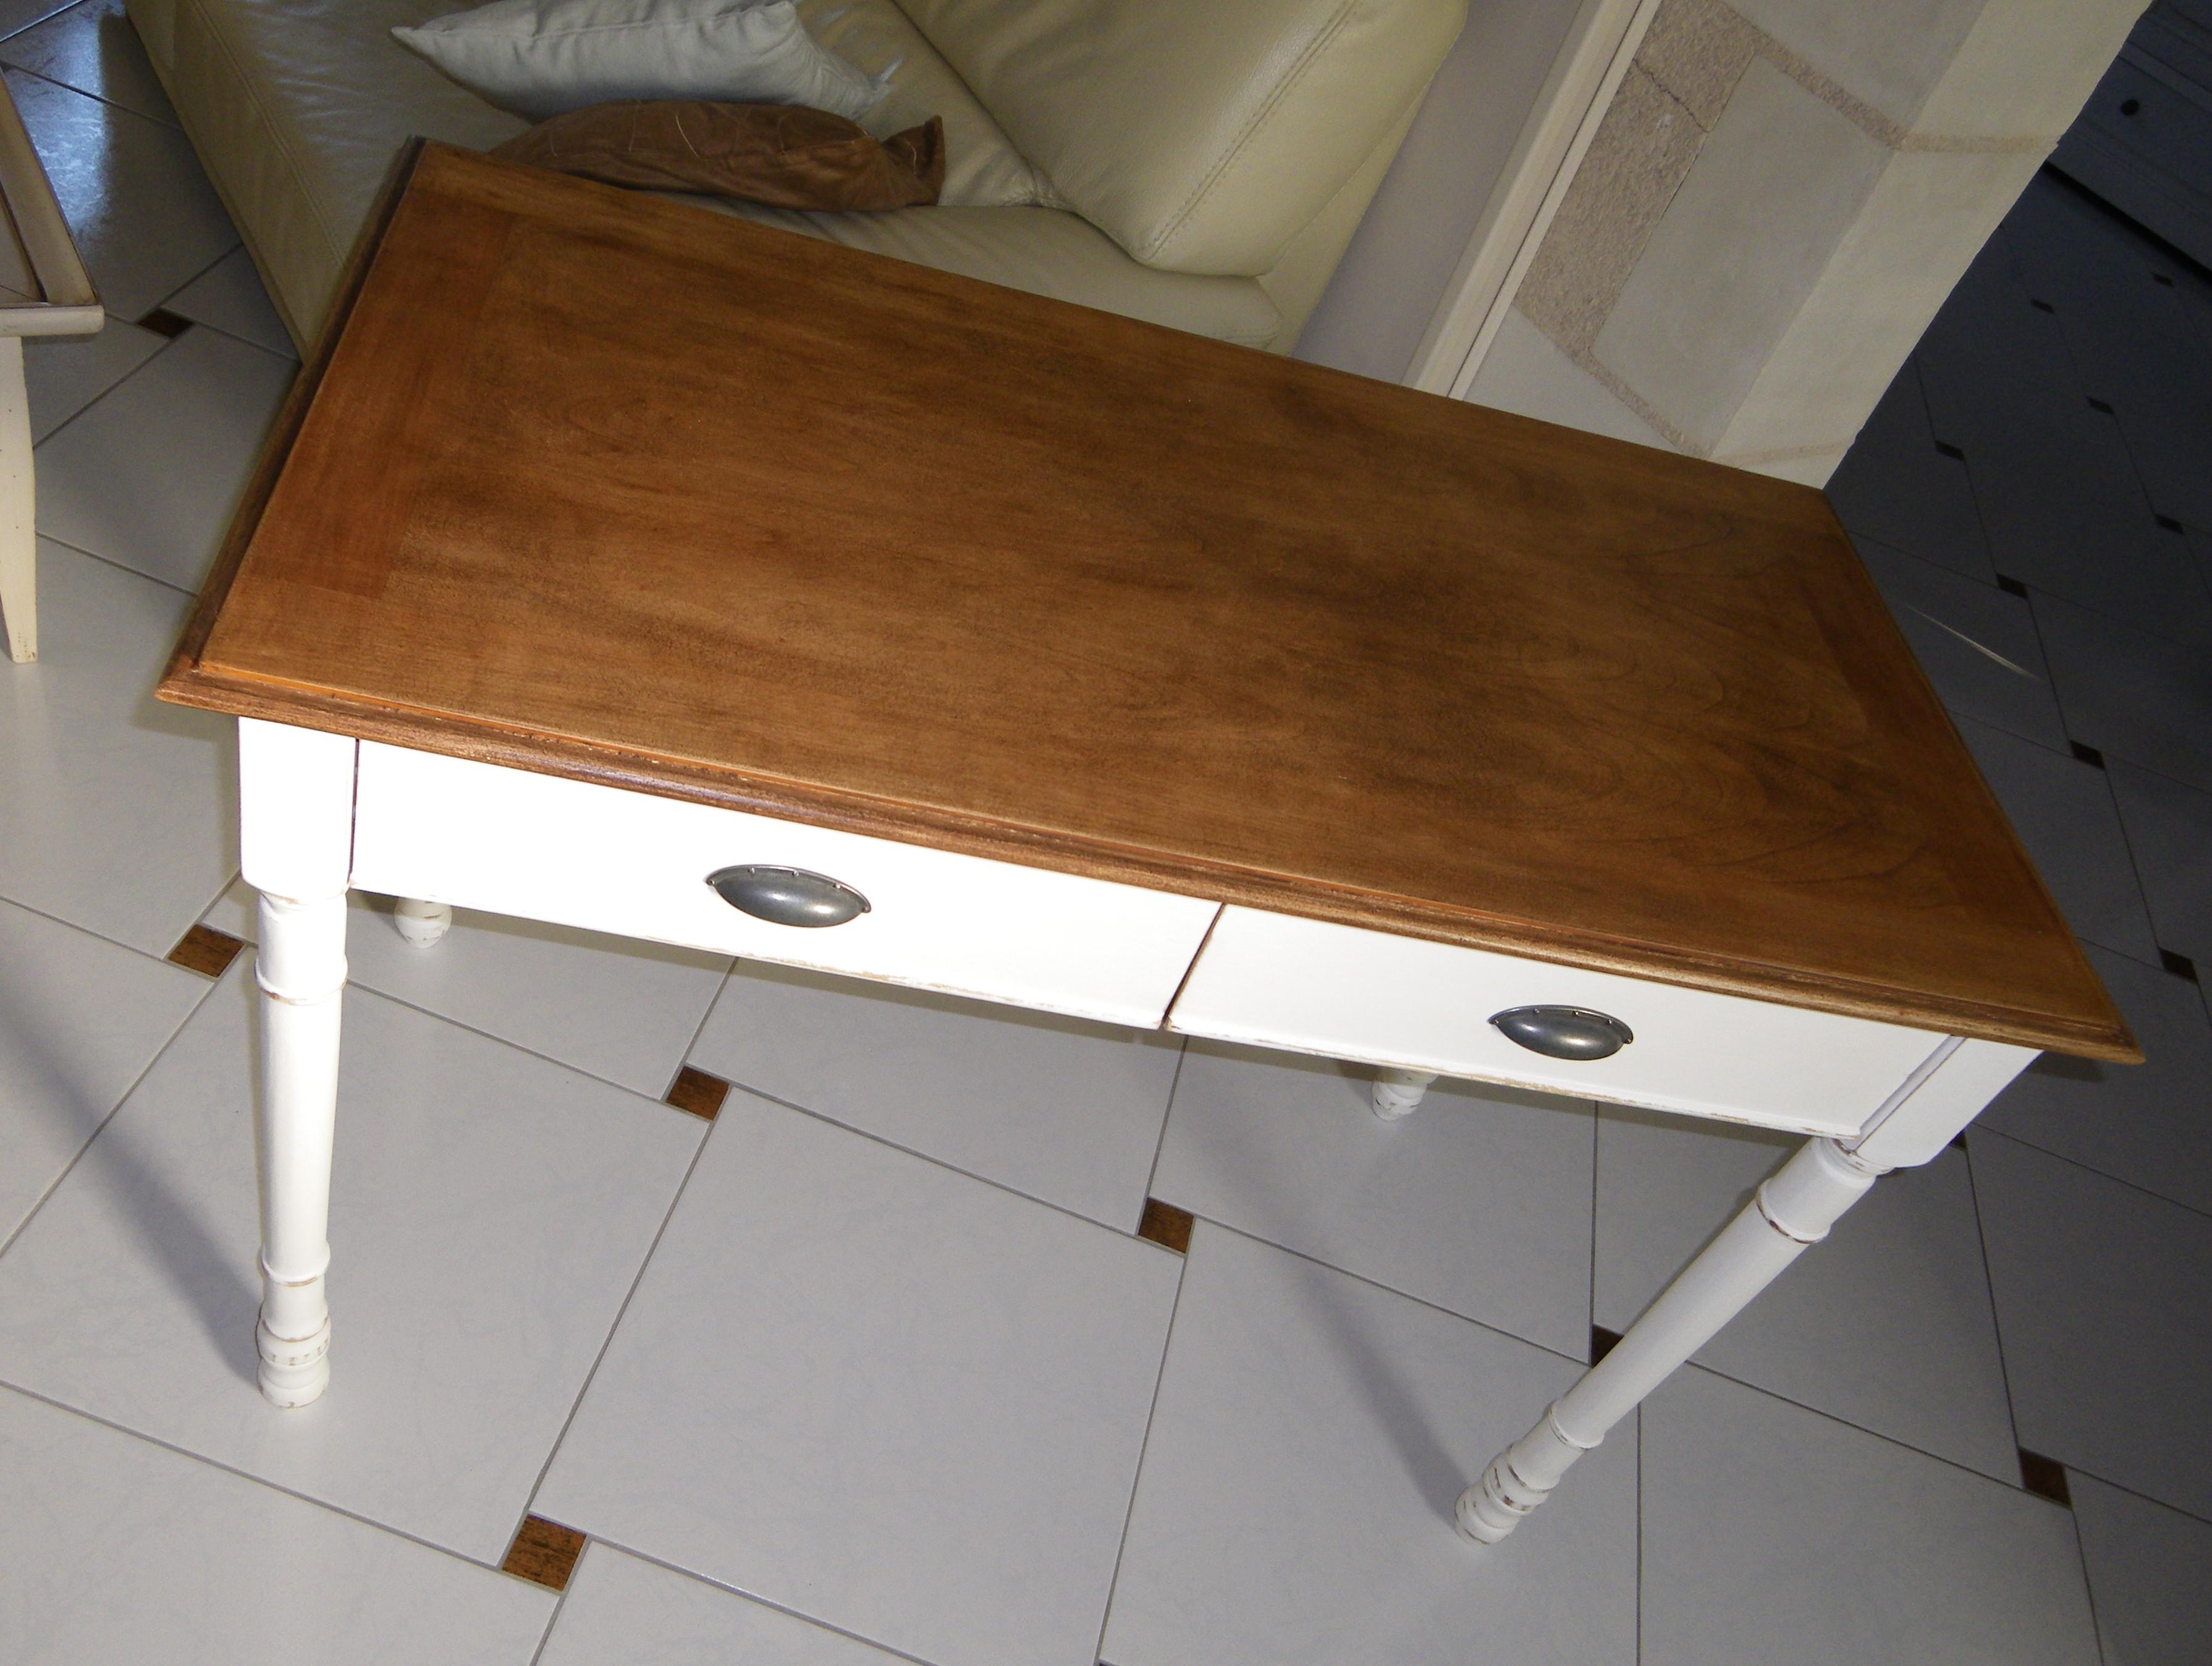 bureau 2 tiroirs poign es coquilles patin blanc et plateau cir ch ne anjoudeco. Black Bedroom Furniture Sets. Home Design Ideas